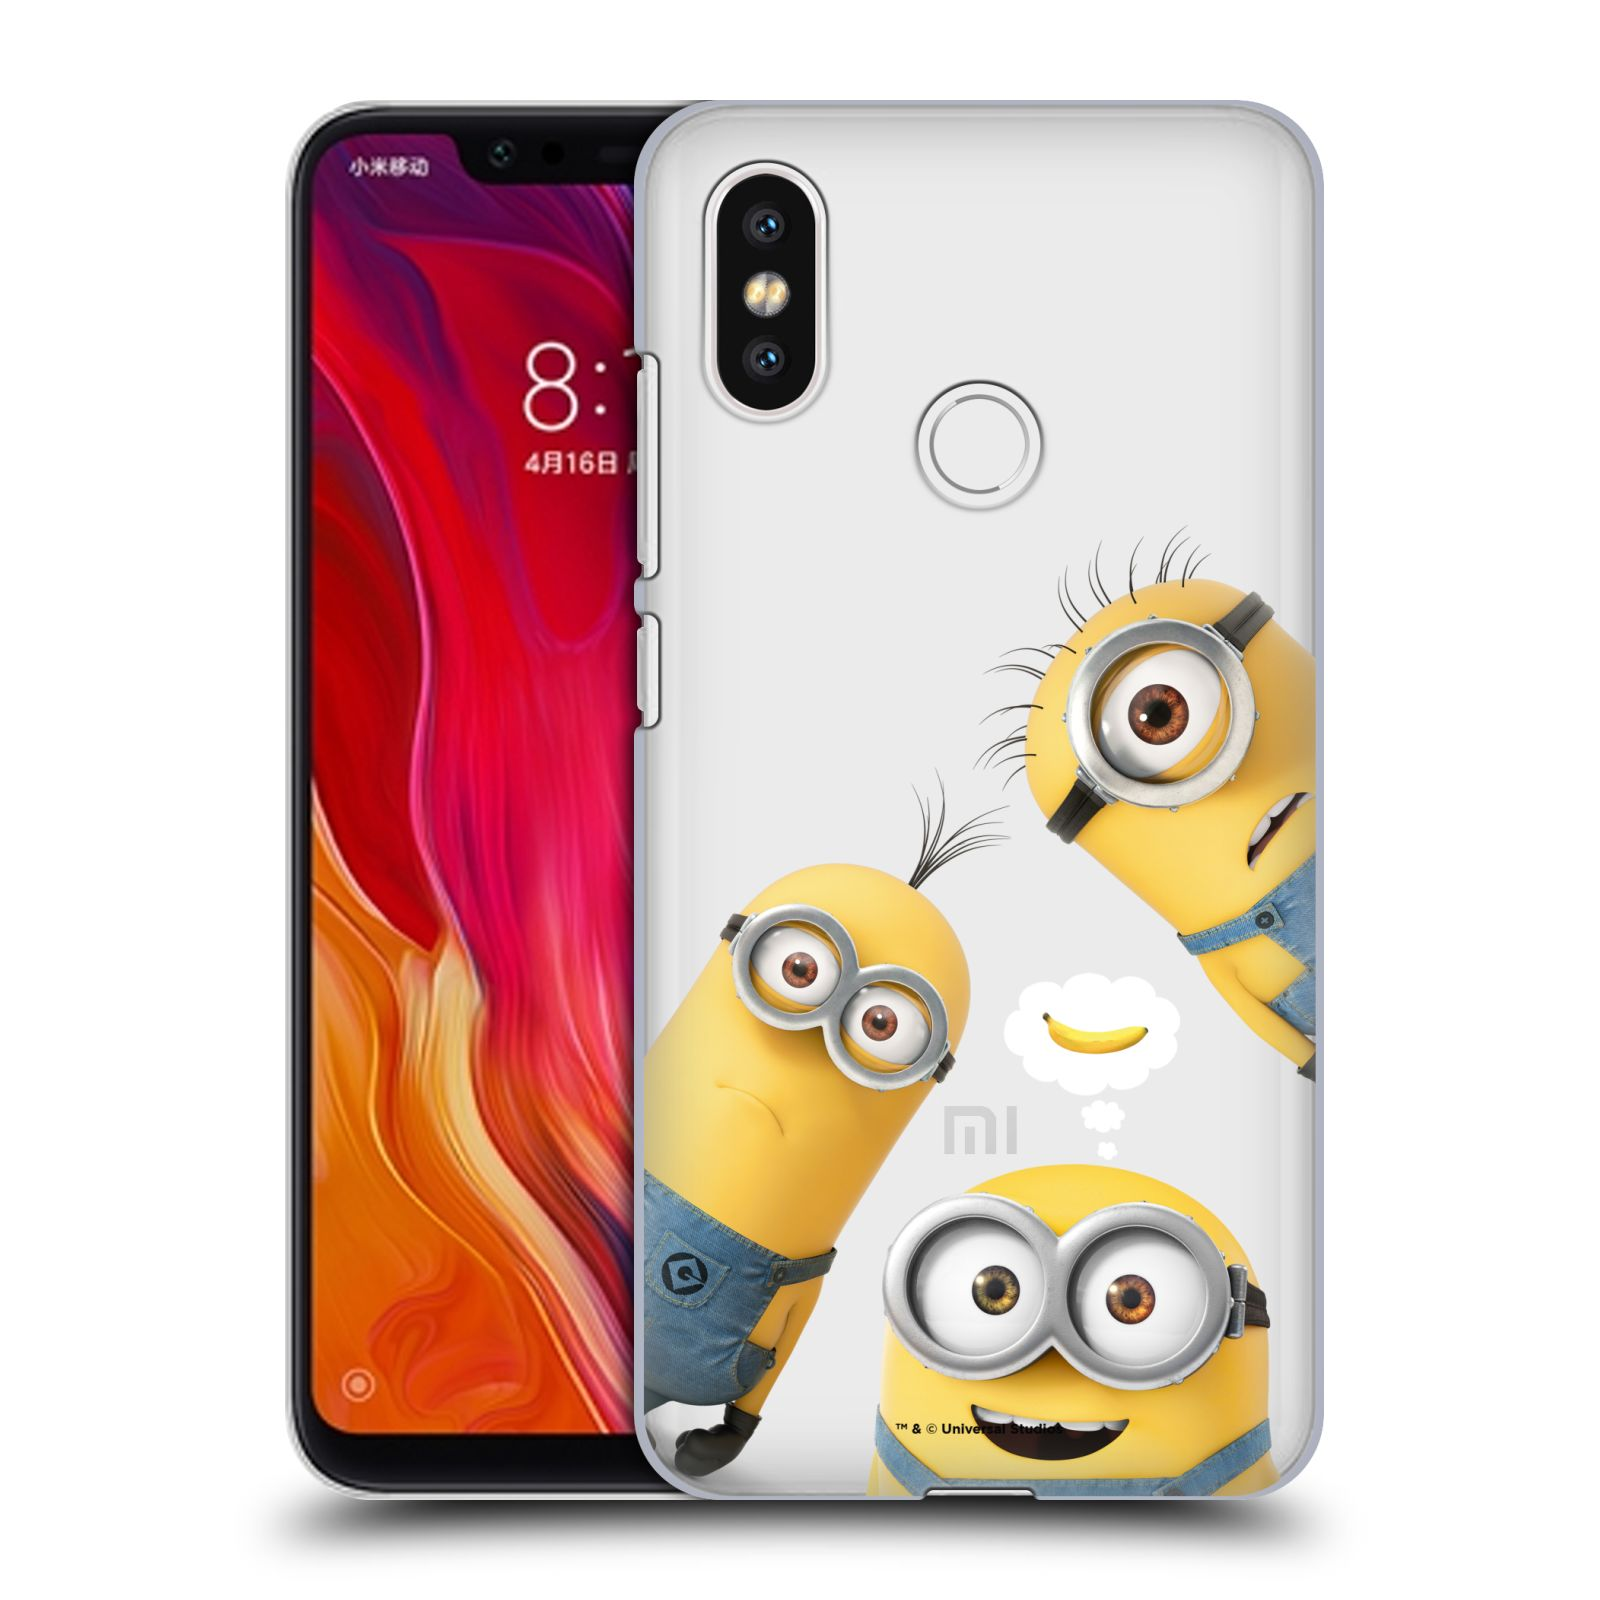 Plastové pouzdro na mobil Xiaomi Mi8 - Head Case - Mimoni Banana z filmu Já, padouch - Despicable Me